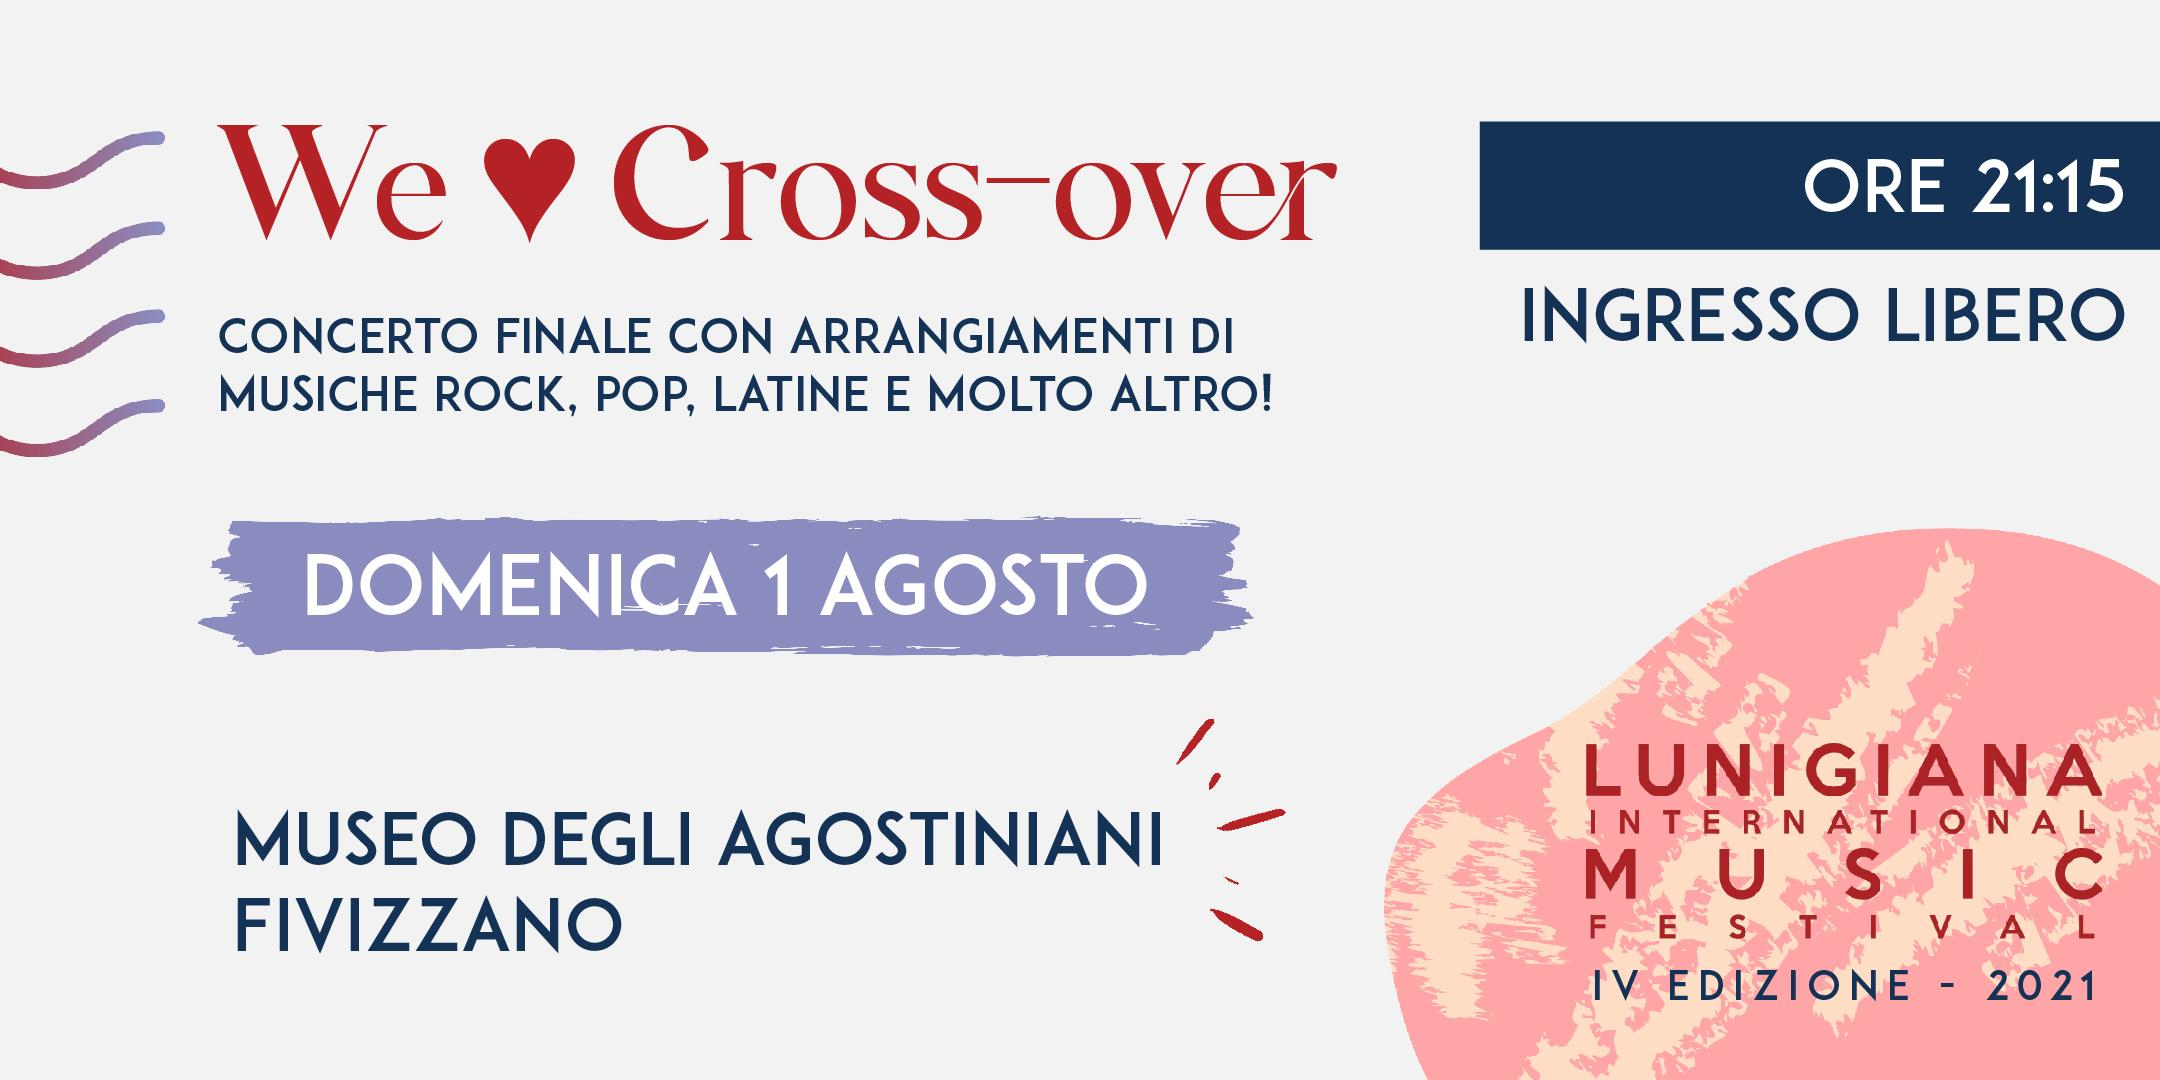 LIMF 2021 – We <3 Cross-over